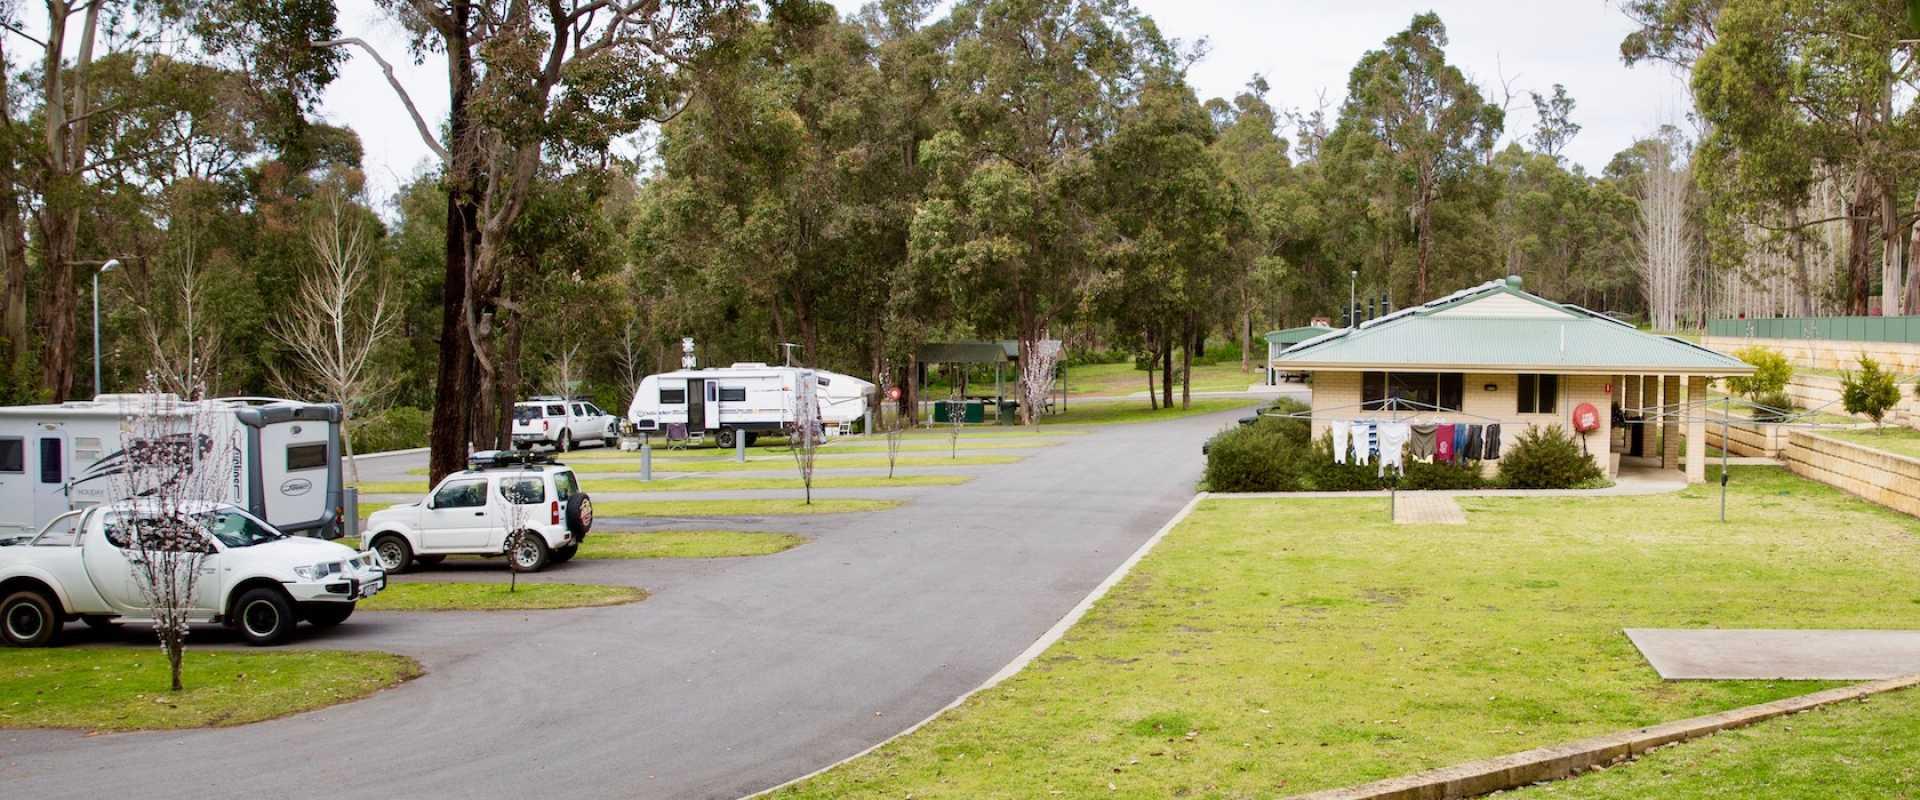 Kui Parks, Manjimup Central Tourist Park, Manjimup WA